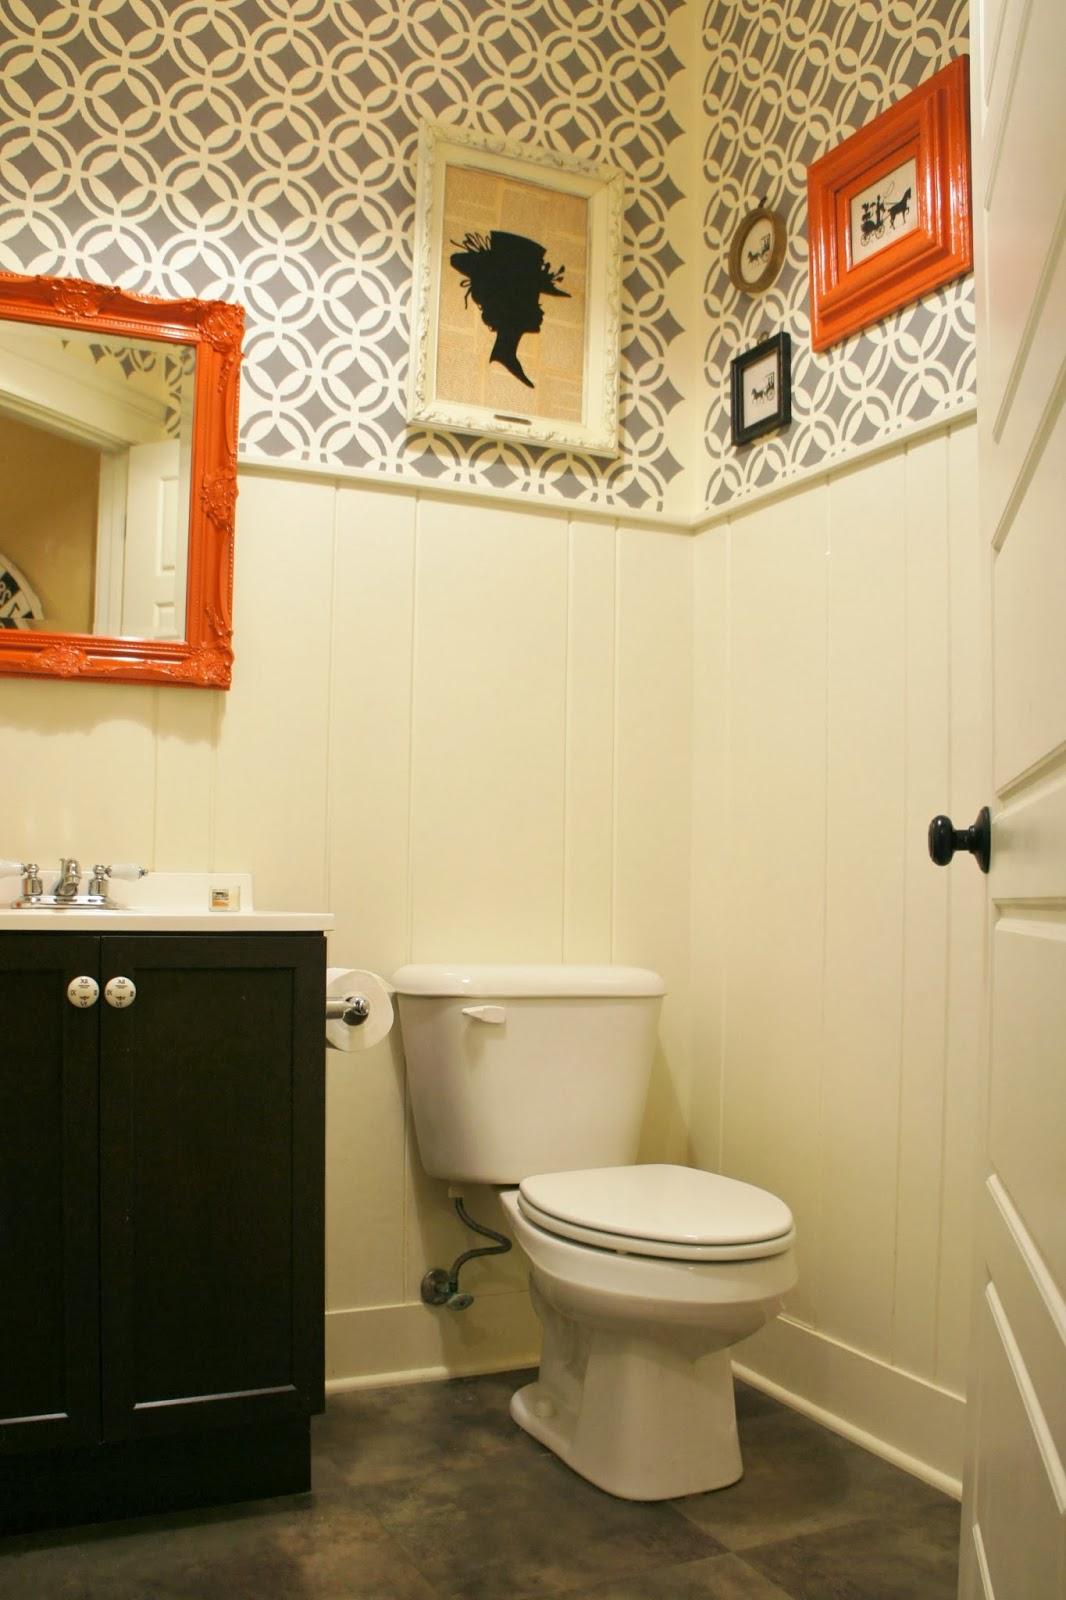 Shannan Martin Writes: Steph\'s Thrifty Half-Bath with the Raddest Walls